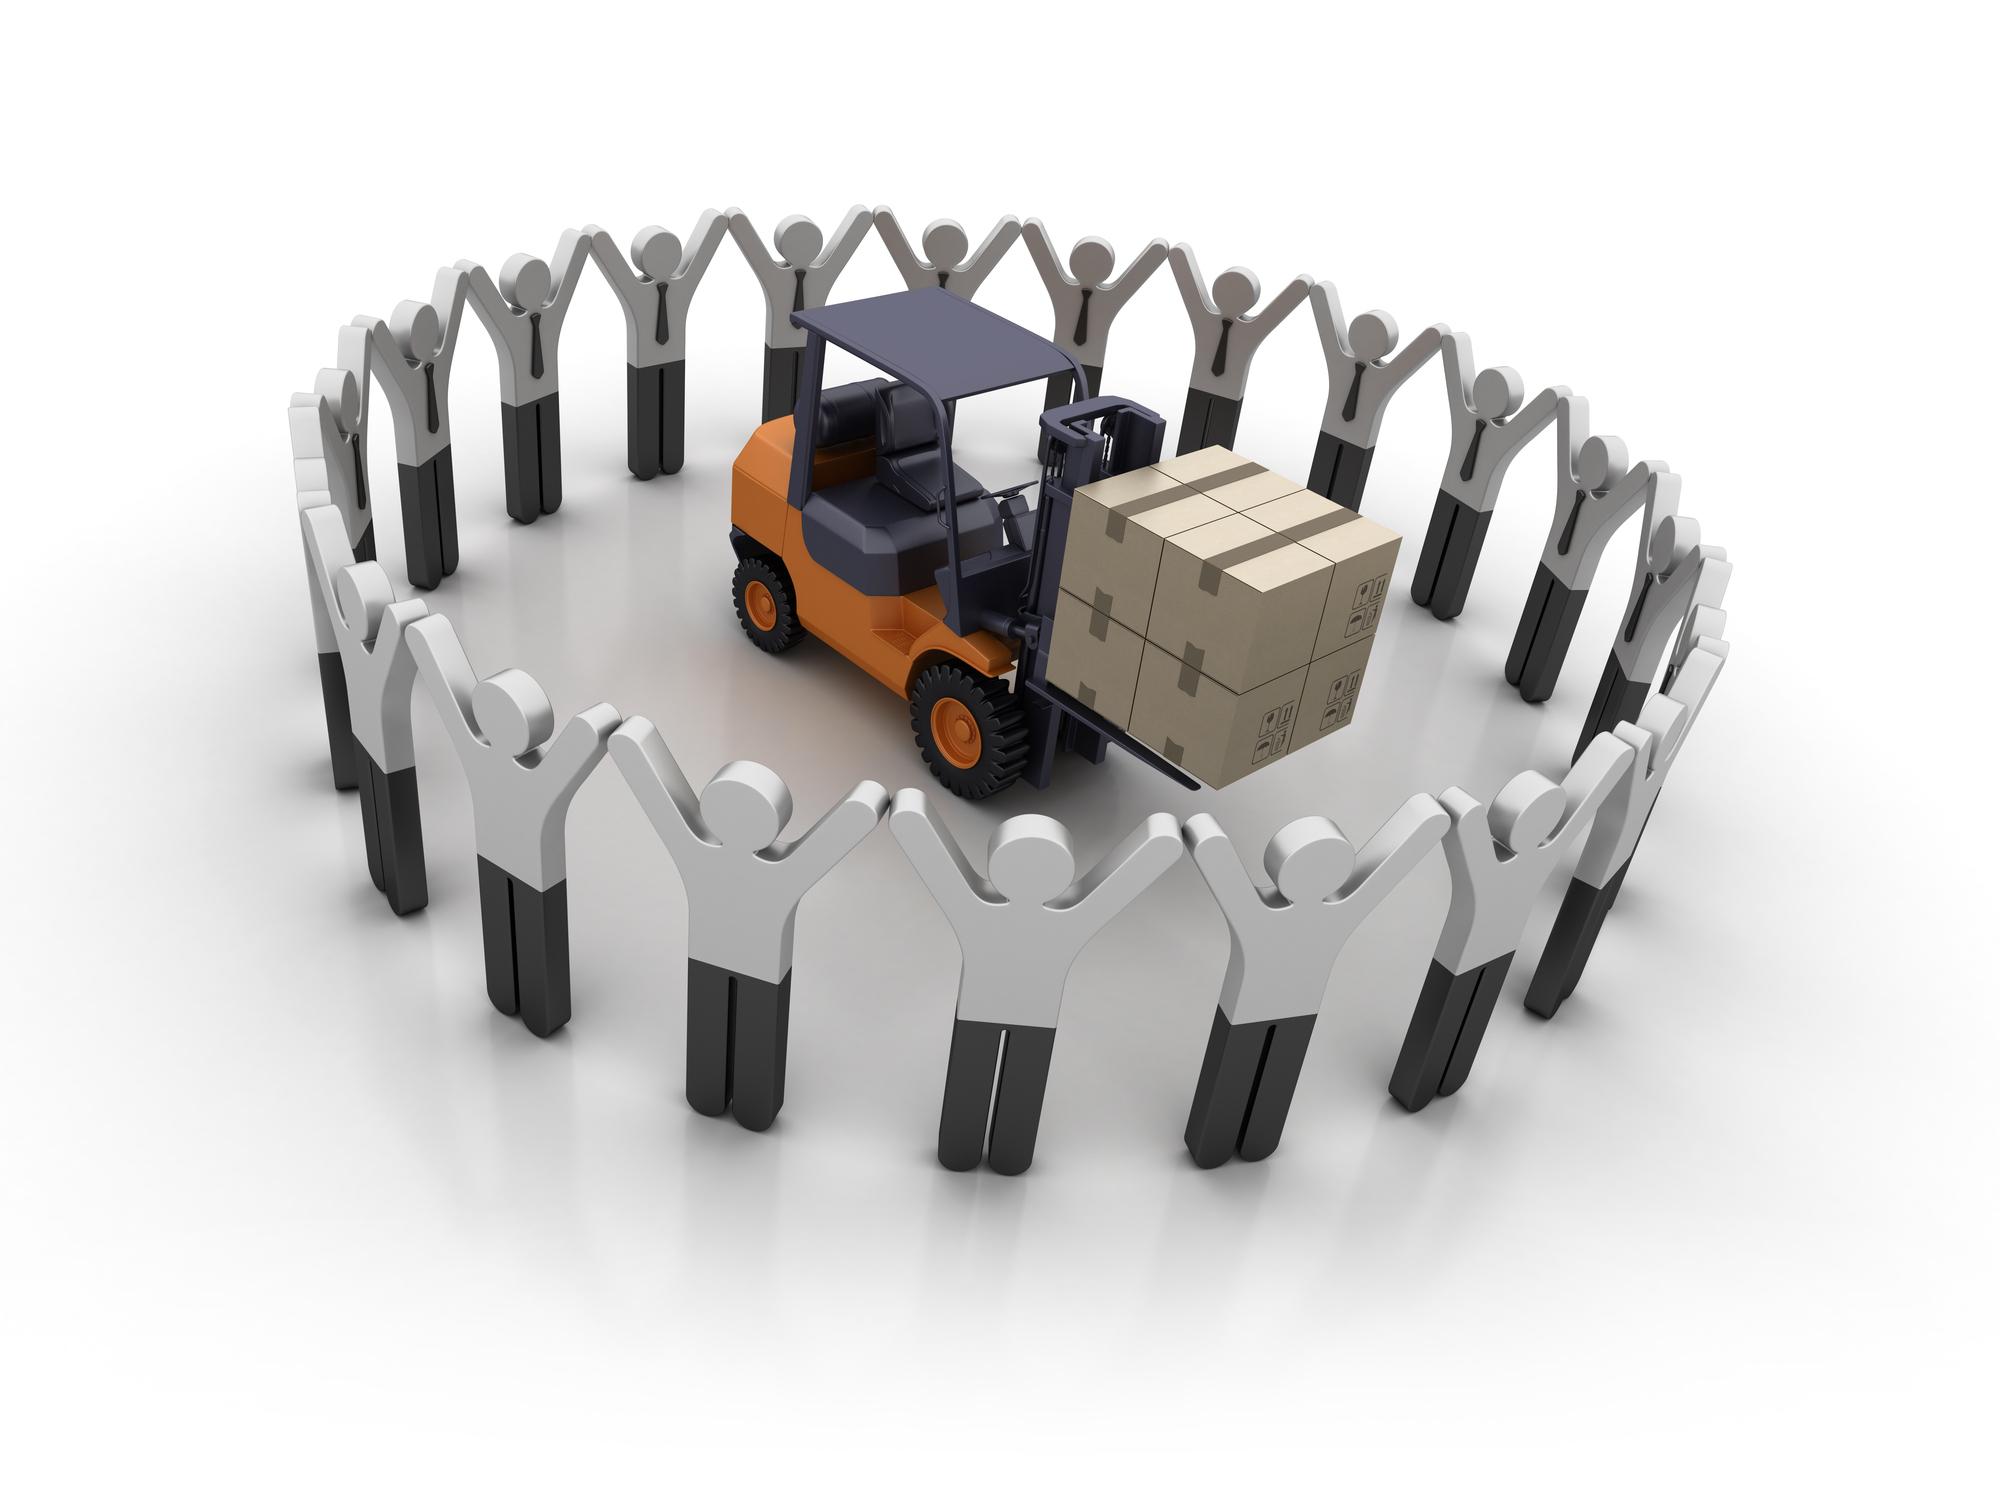 Pictogram Teamwork with Forklift - White Background - 3D Rendering - Newegg Logistics Warehouse